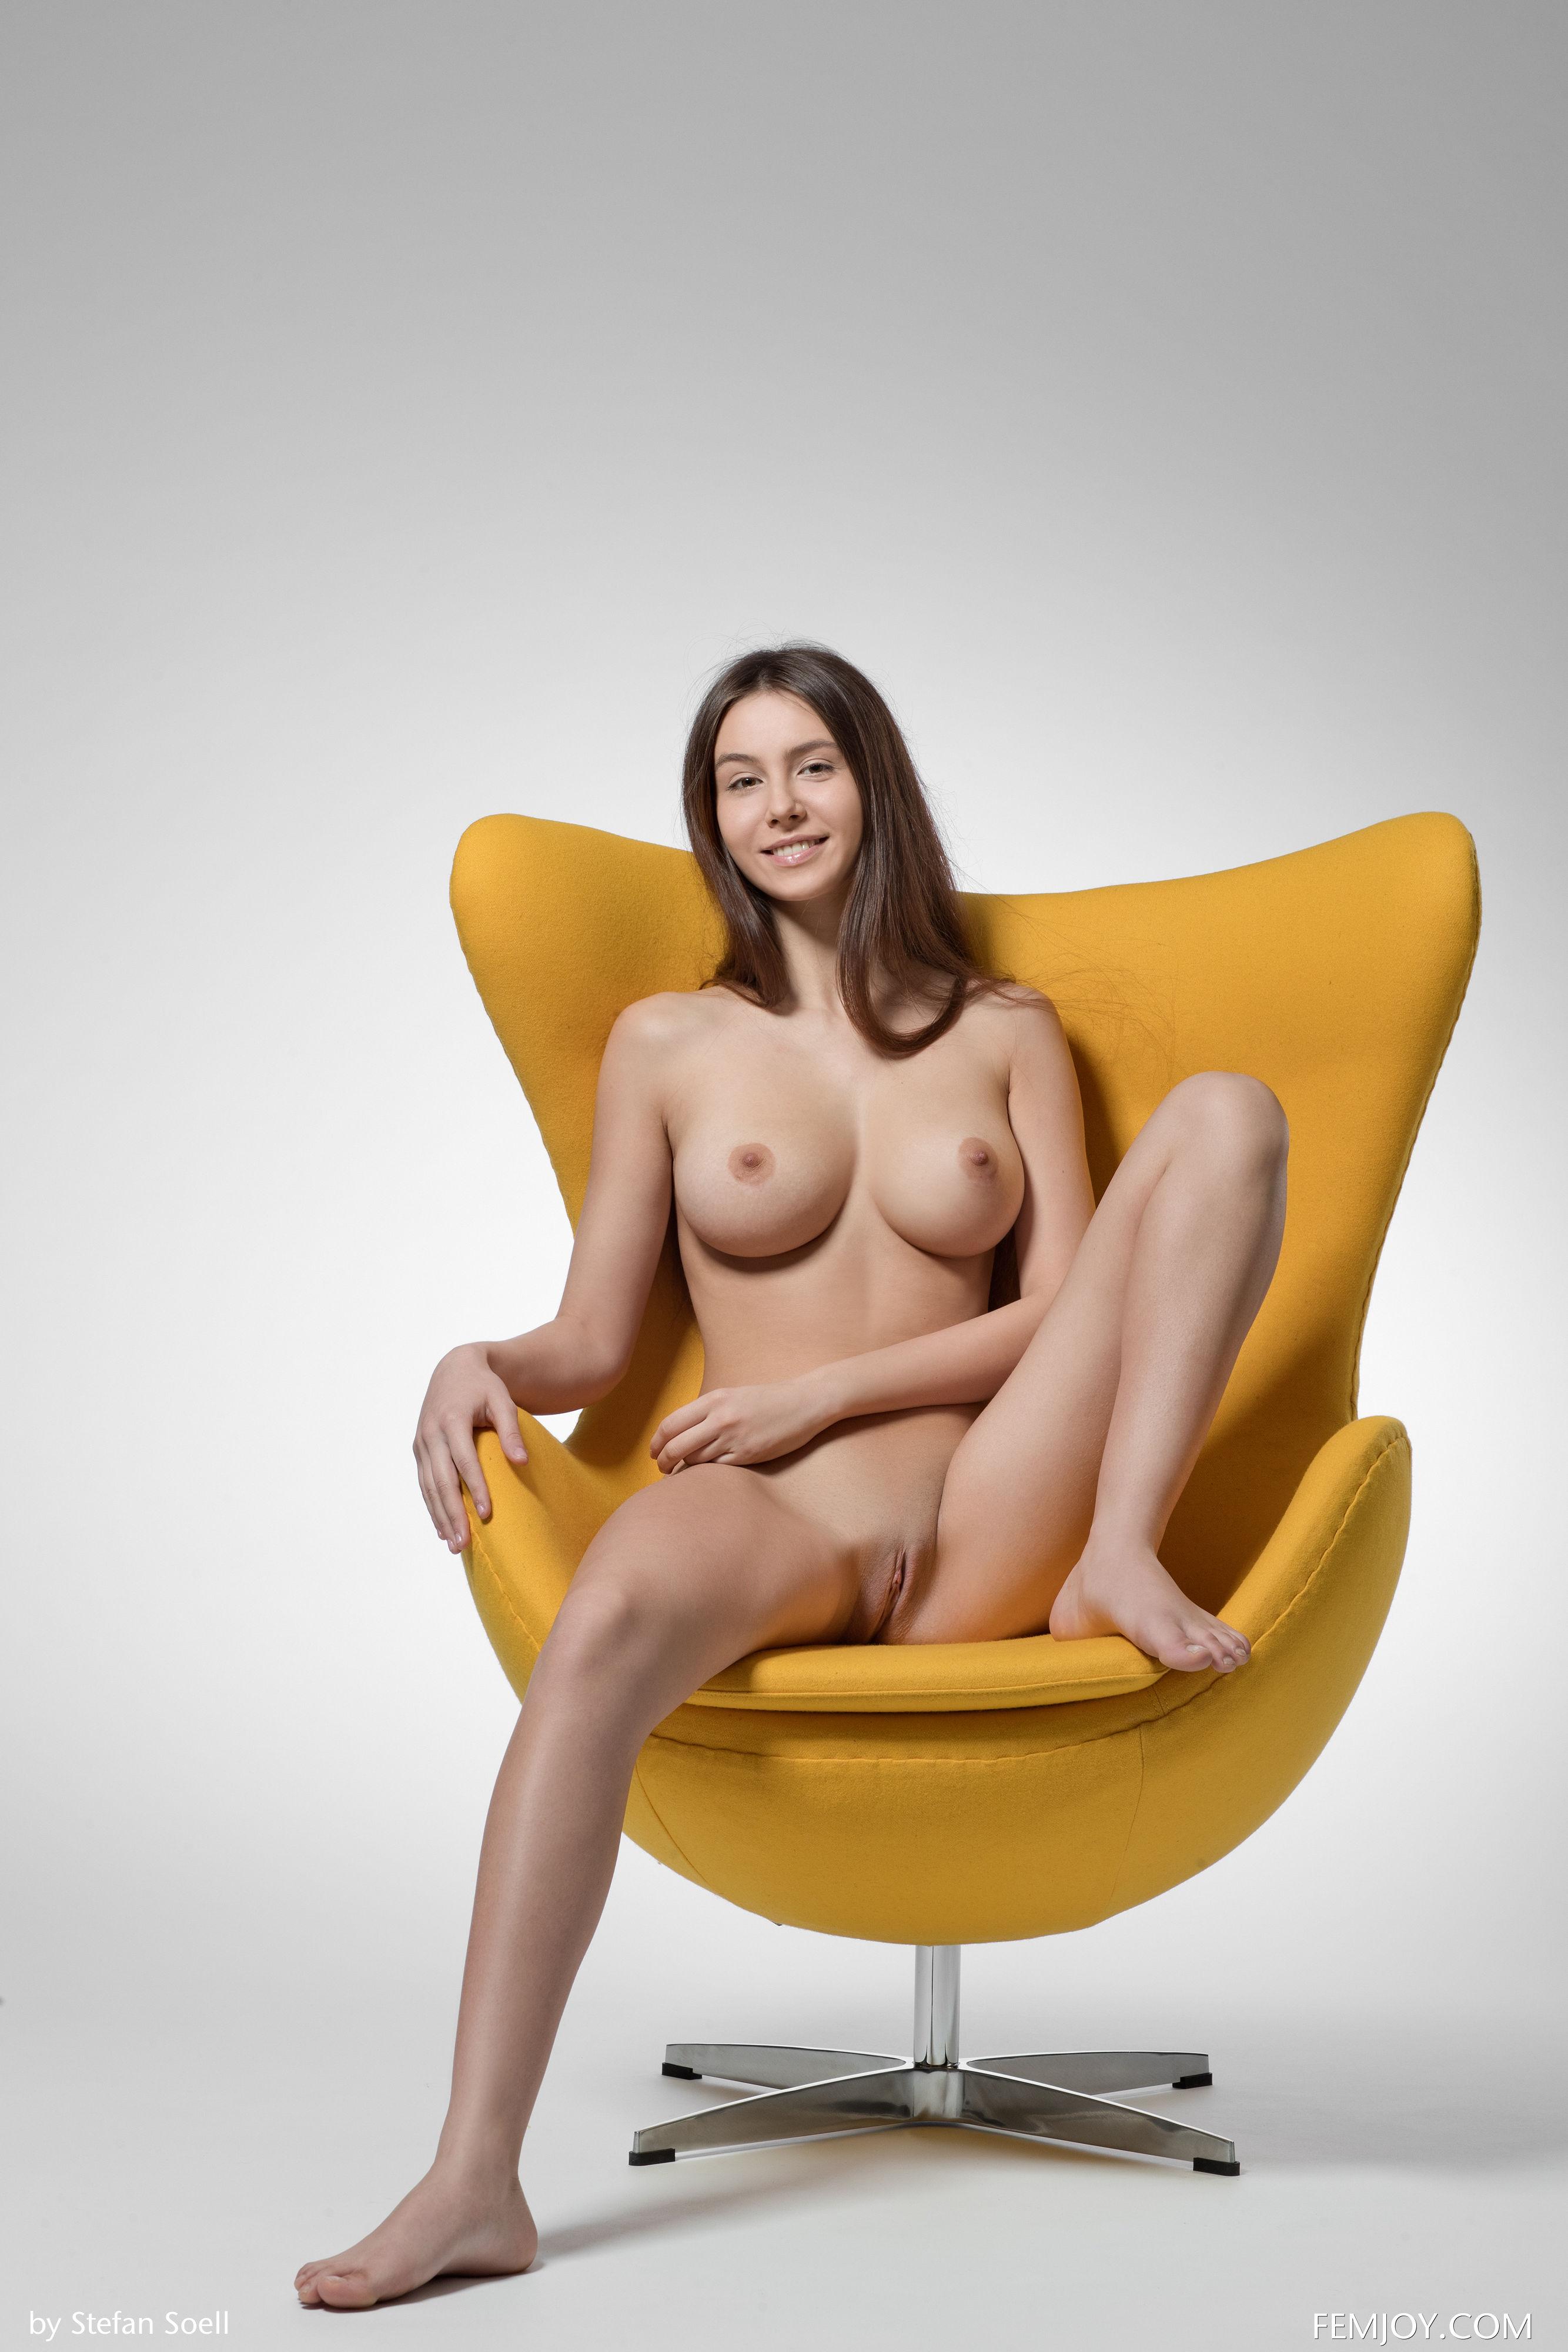 76857625_alisai_femjoy_stefansoell_yellow_19052018p_06.jpg